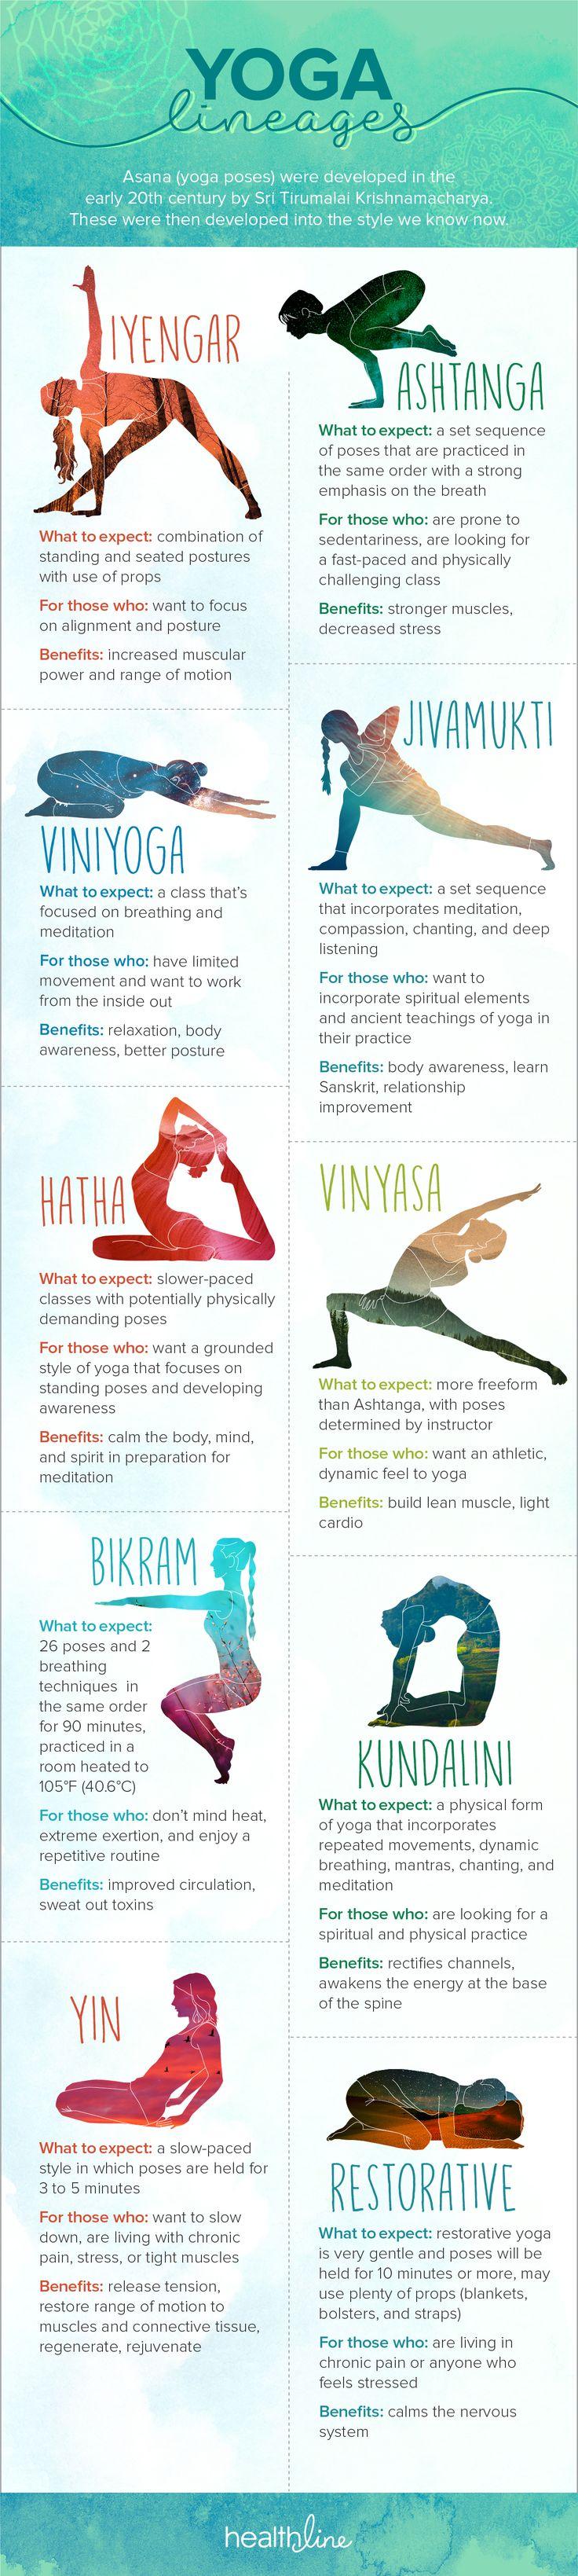 definitive guide: yoga